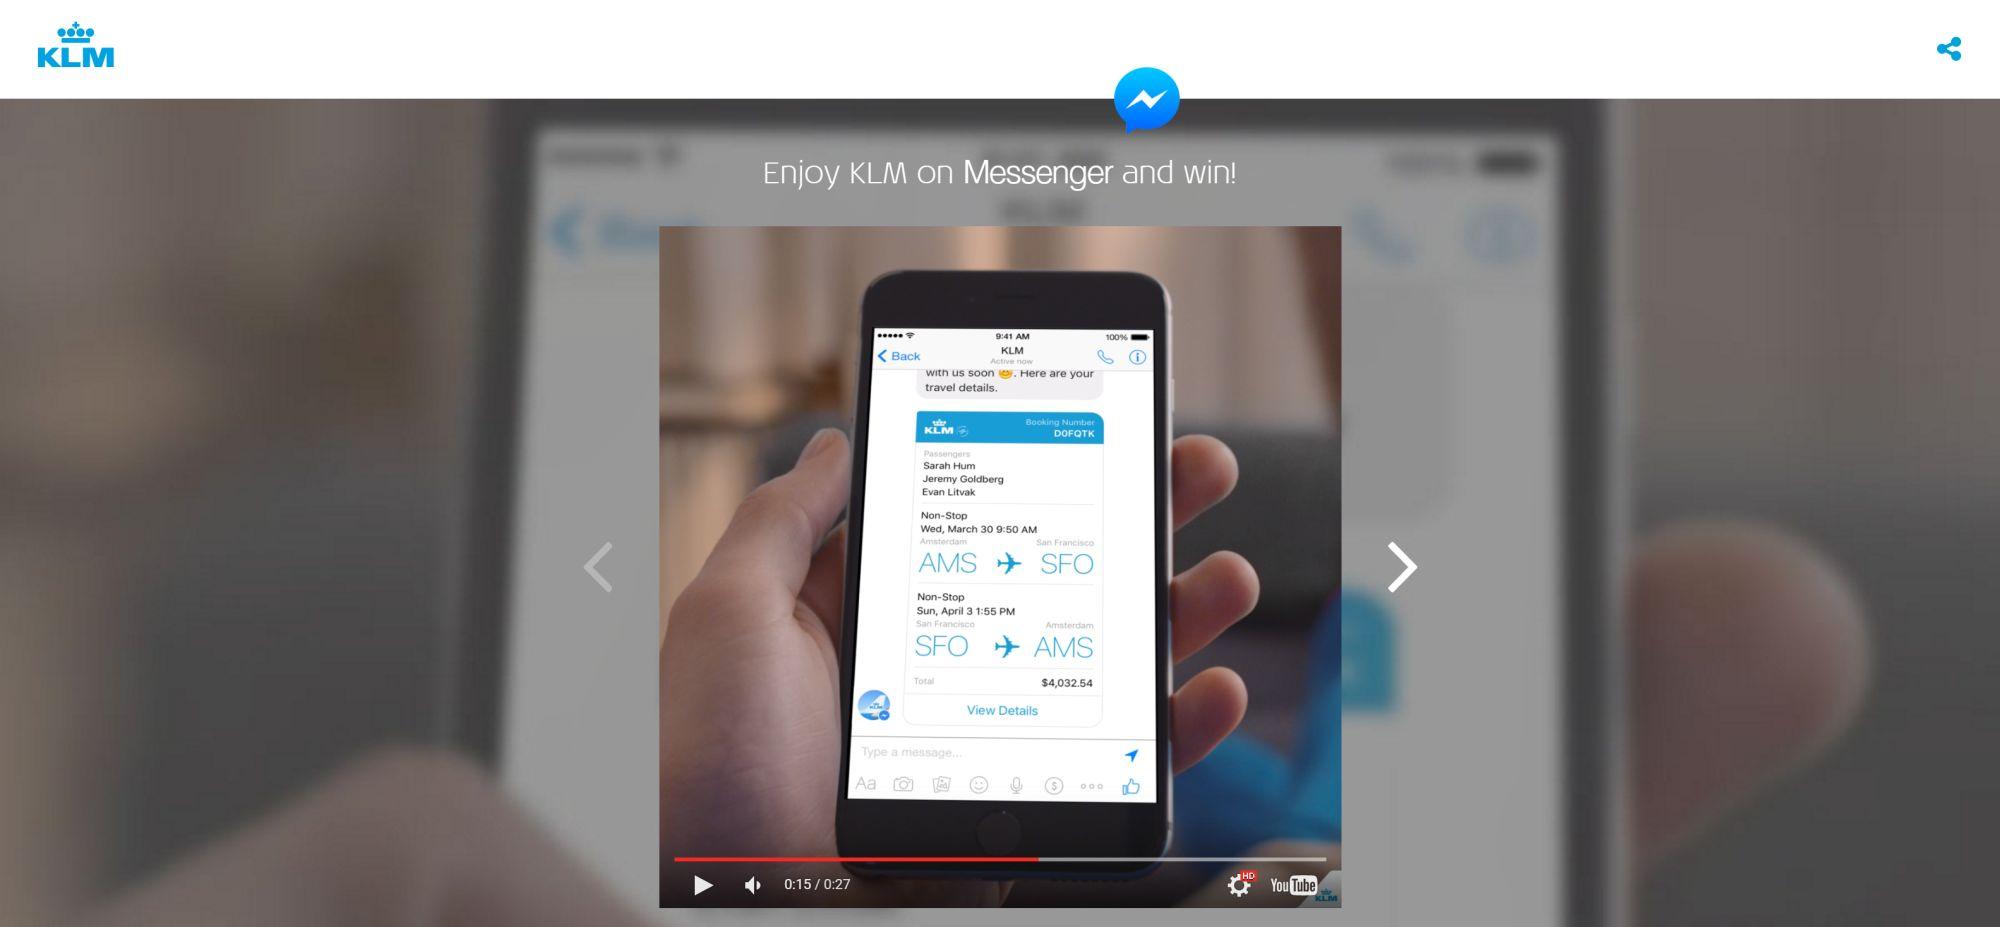 KLM is now on Facebook Messenger